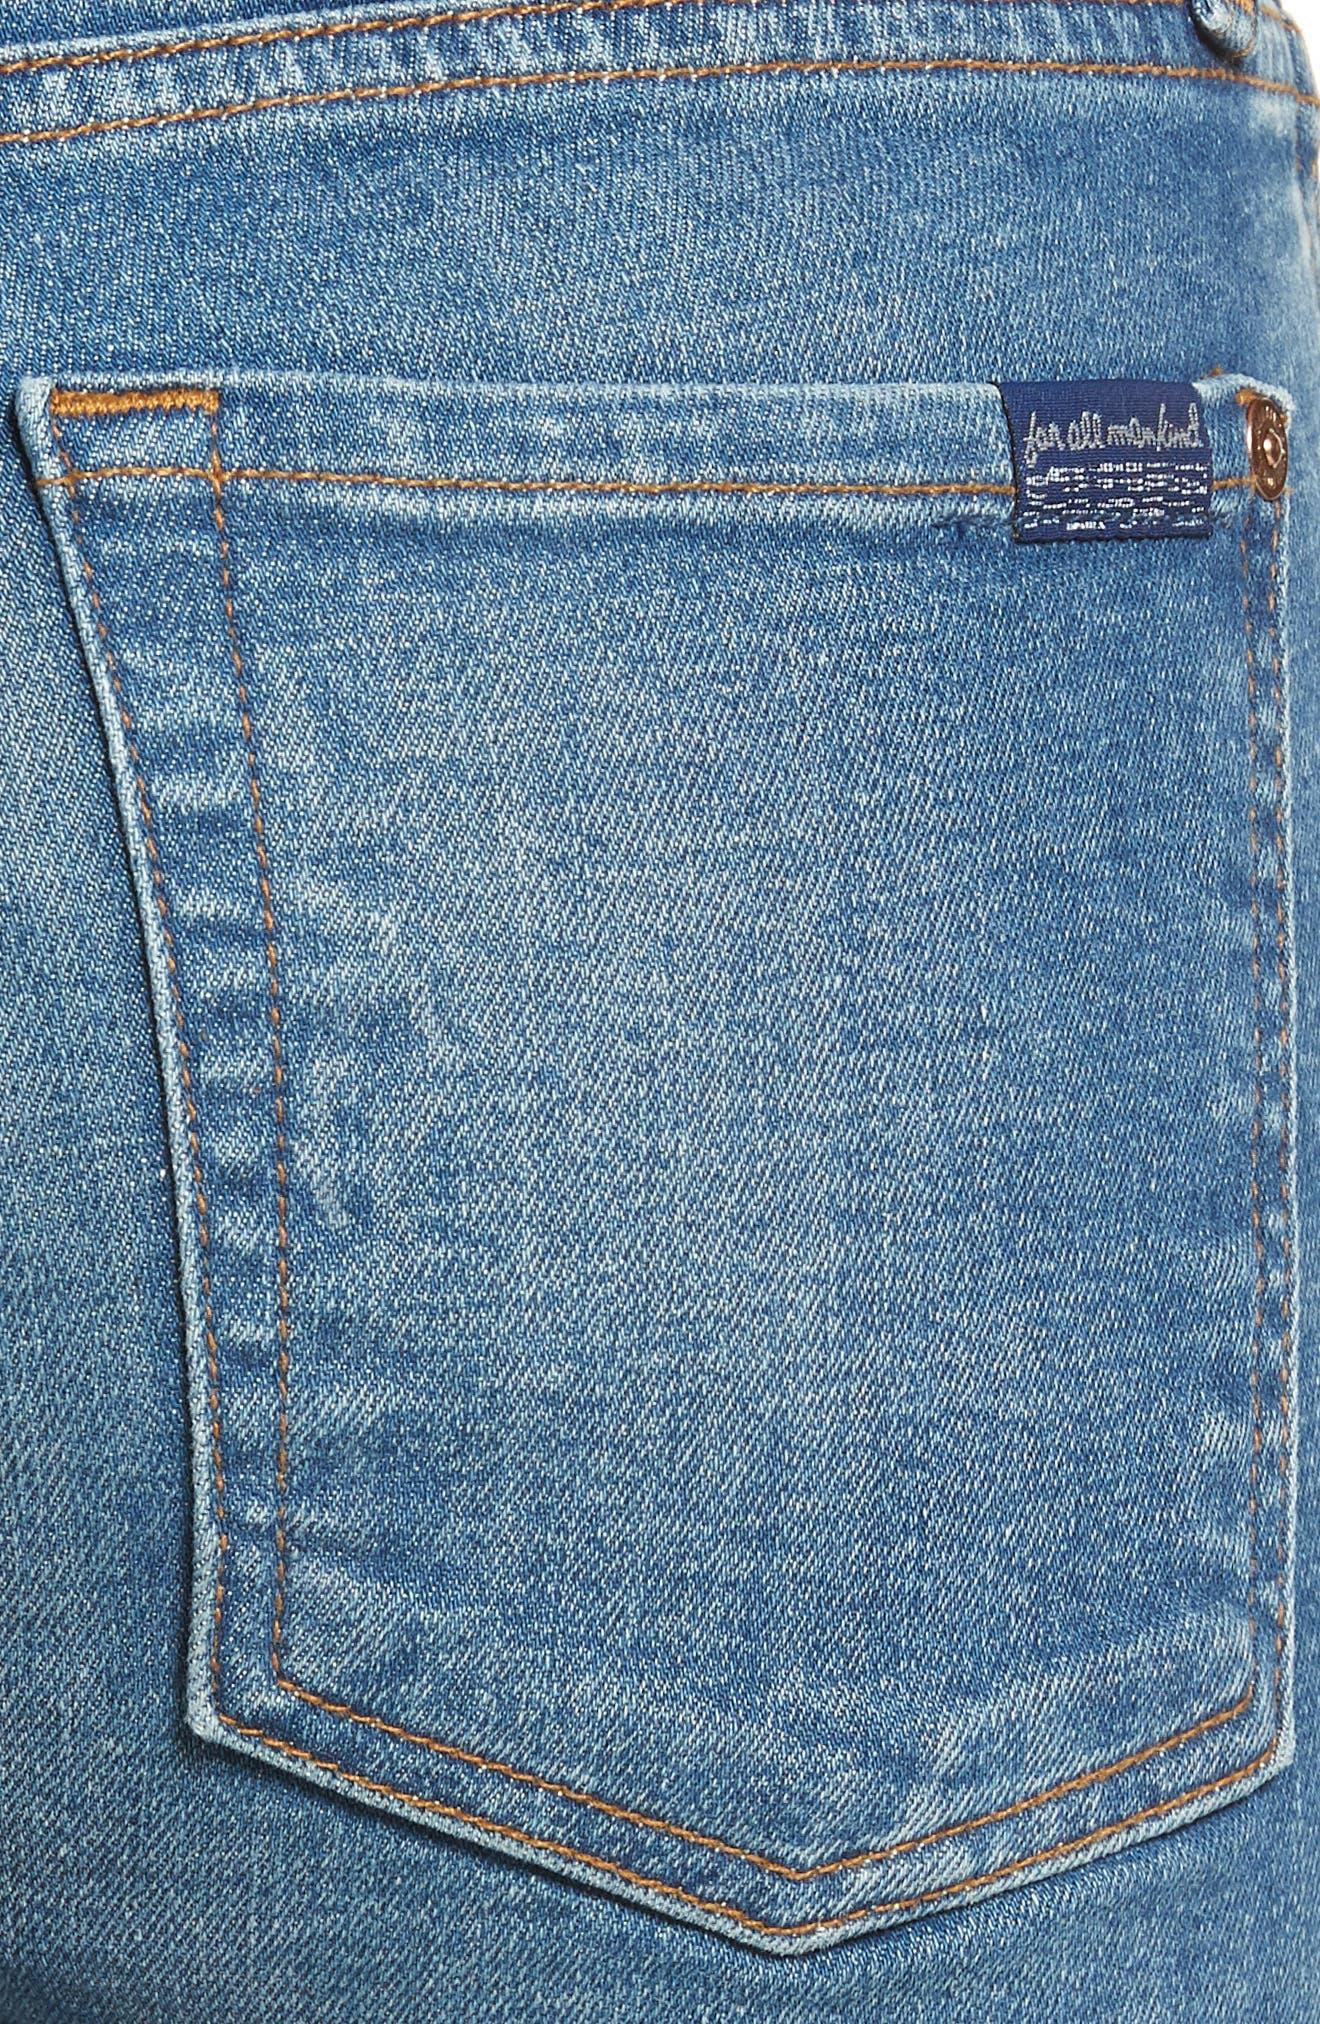 Dylan Straight Leg Jeans,                             Alternate thumbnail 4, color,                             Heritage Art Walk